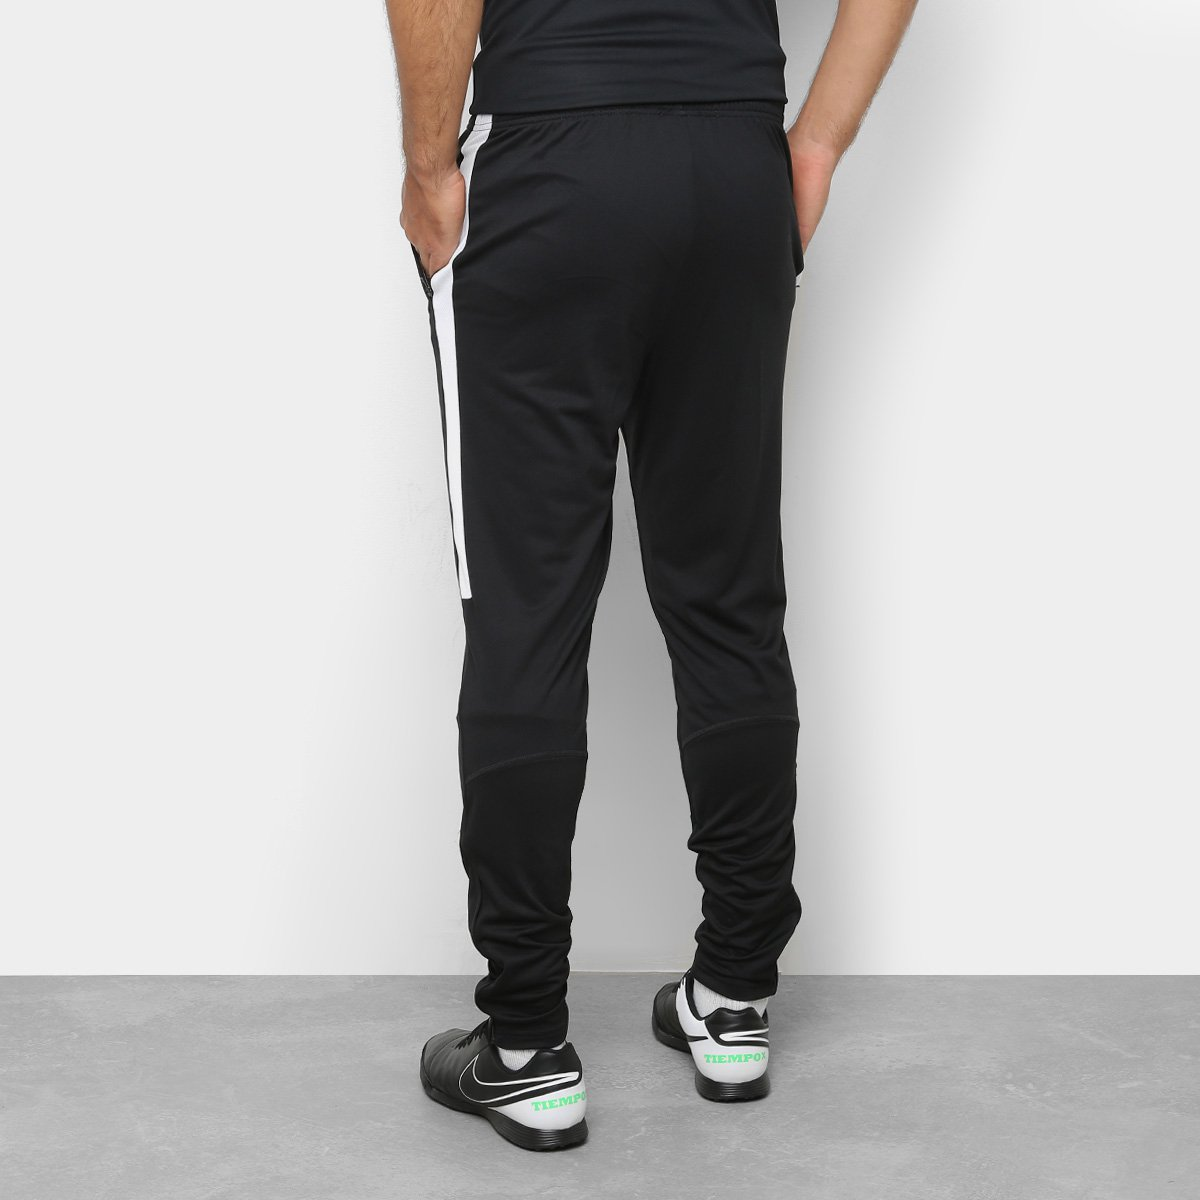 Calça Nike Dri-Fit Academy Masculina - Preto e Branco - Compre Agora ... b8ad7ab7d67d3